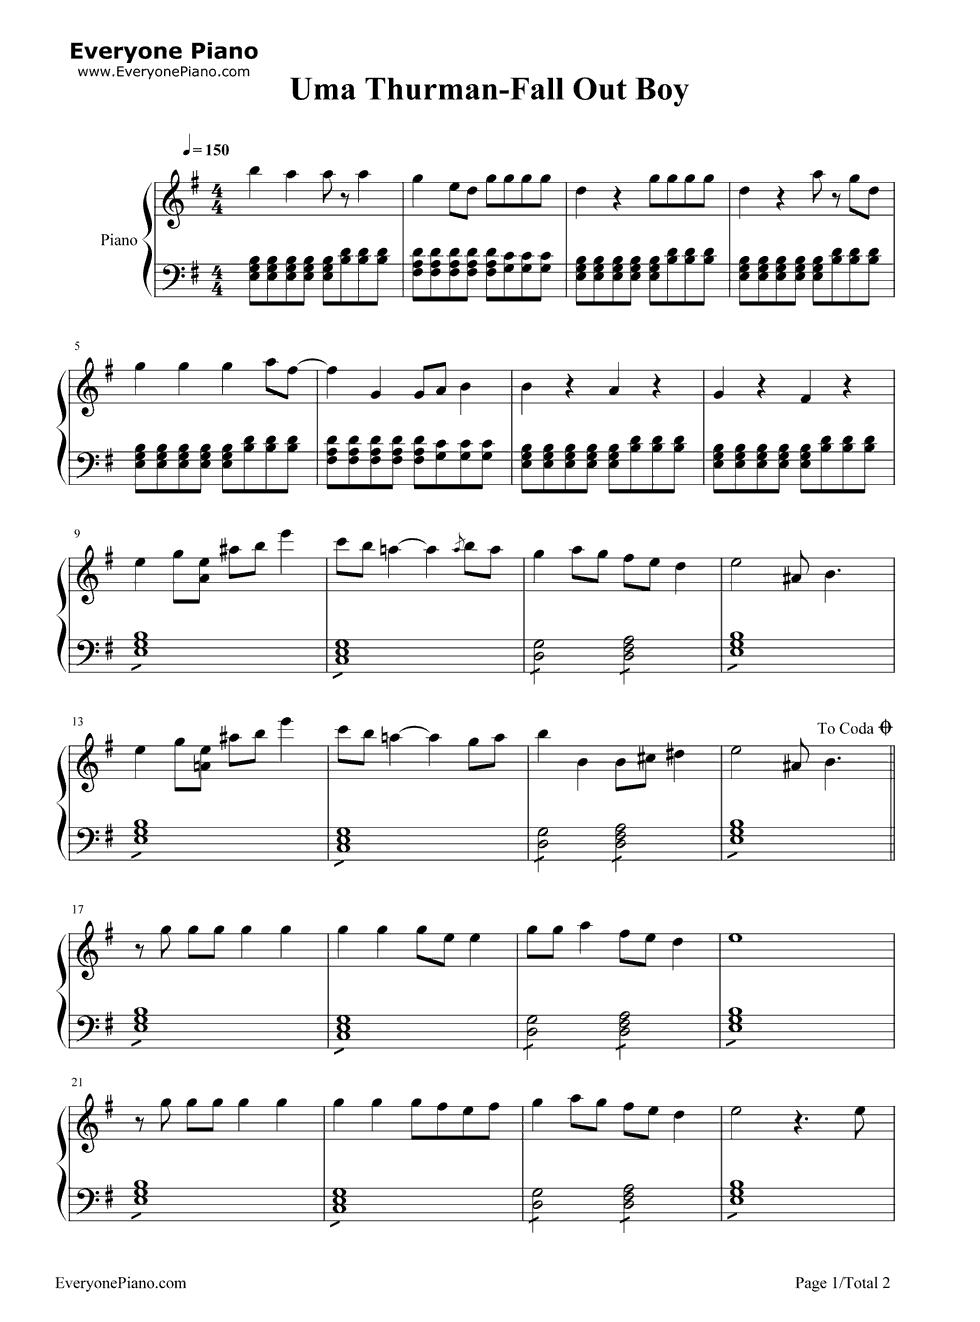 Uma Thurman-Fall Out Boy Stave Preview 1-Free Piano Sheet Music u0026 Piano Chords